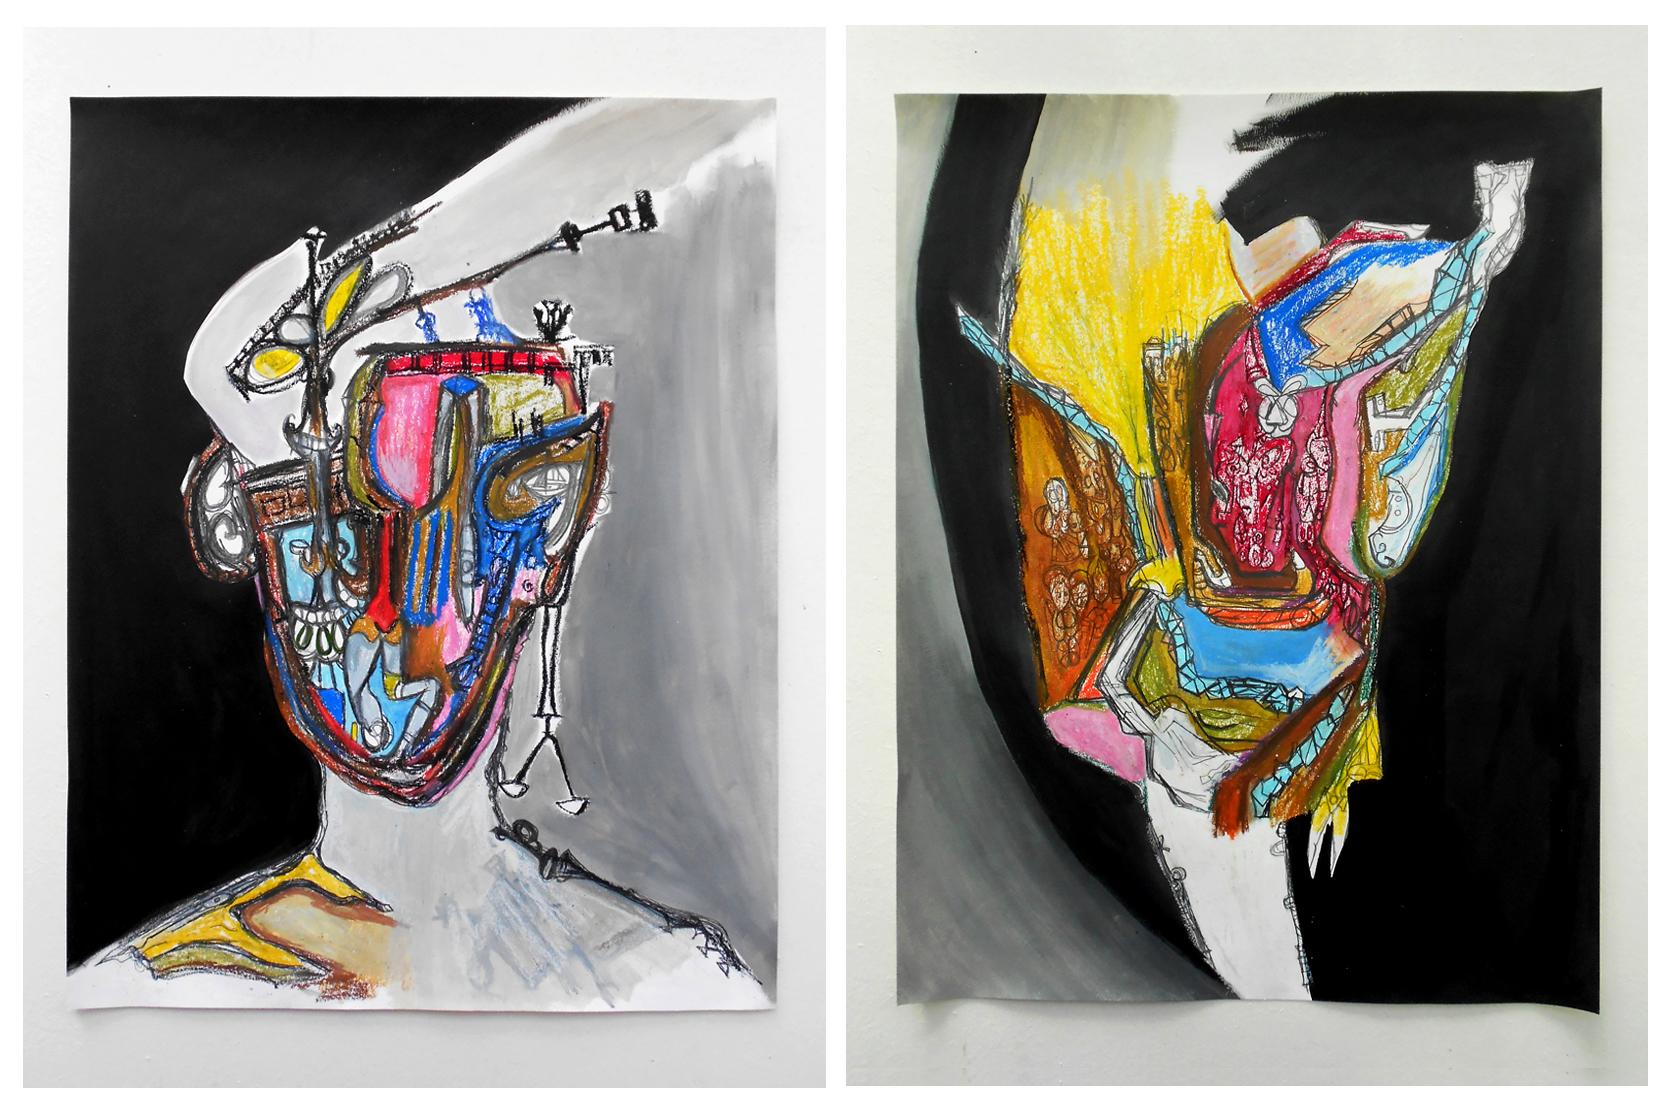 Convertible Heads LX, 2014